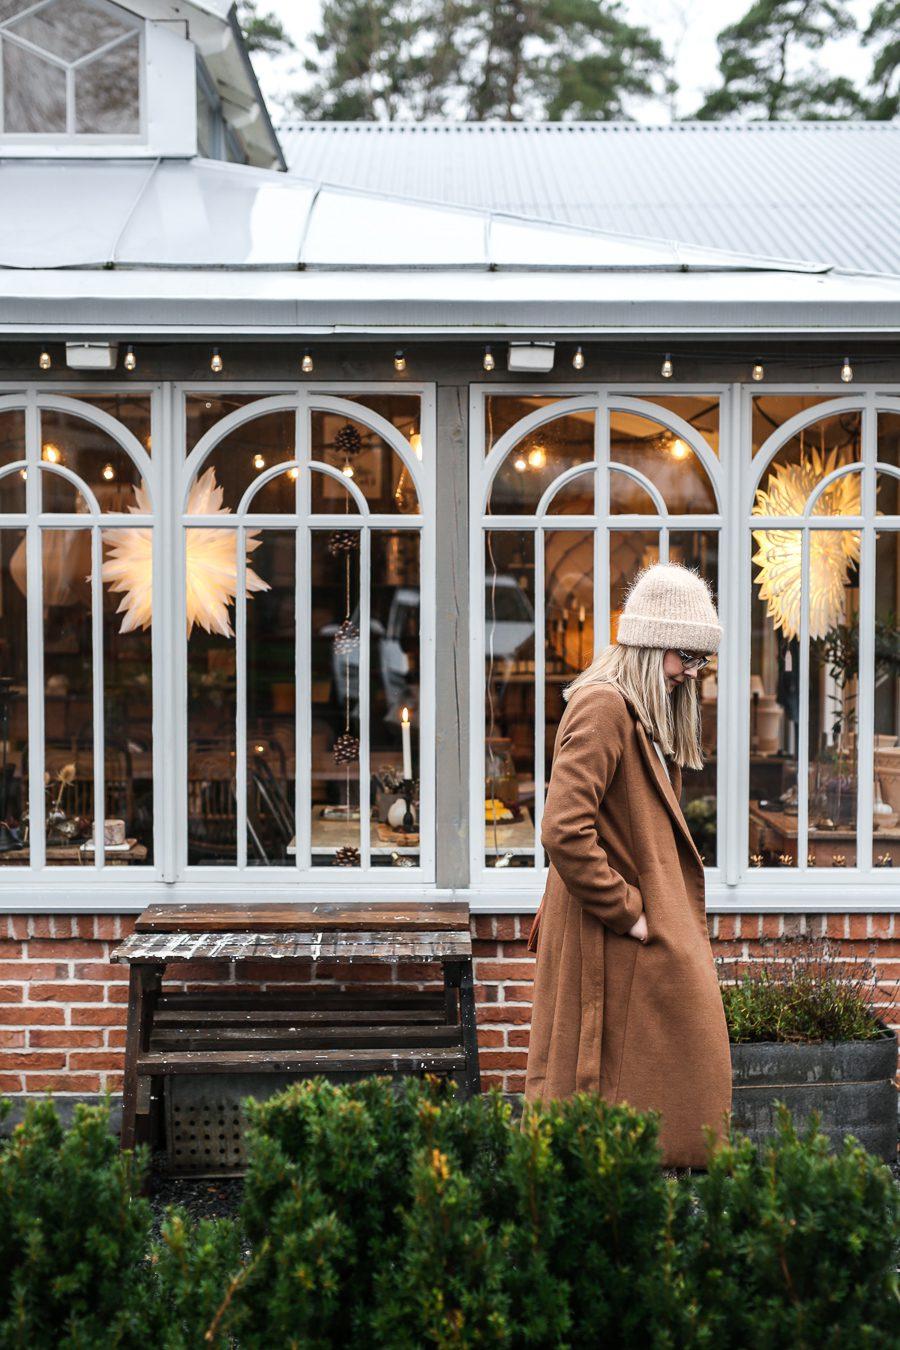 viktoria holmgren lovely life jonkoping leca cafe vaxthus linnea leitnlosinspiration